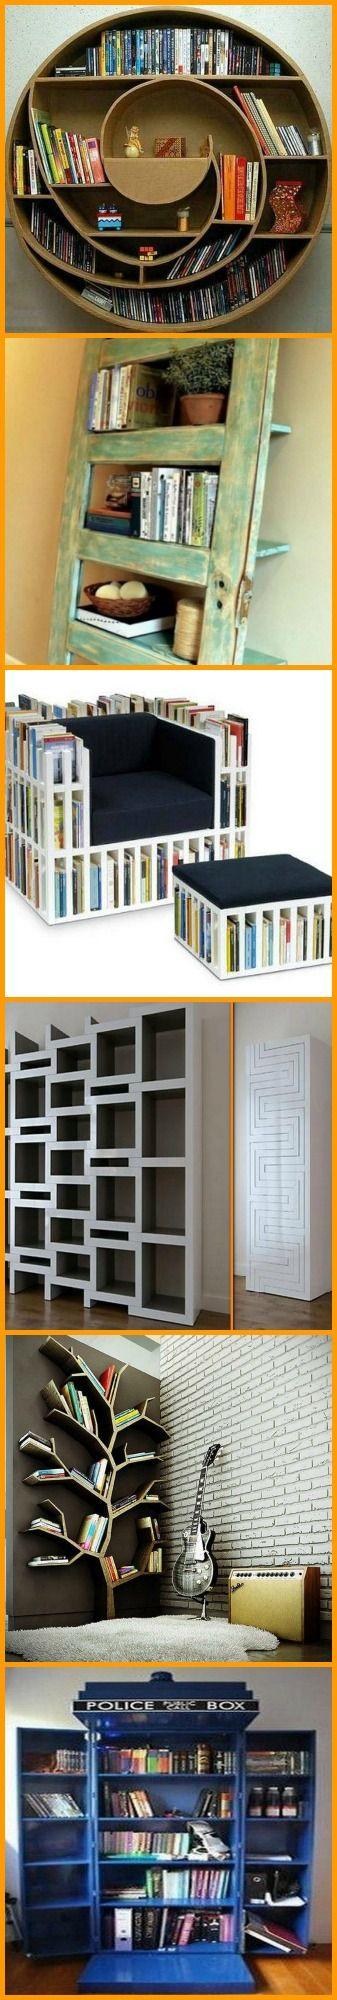 Different Bookshelves 36 best bookshelves inspiration images on pinterest | projects